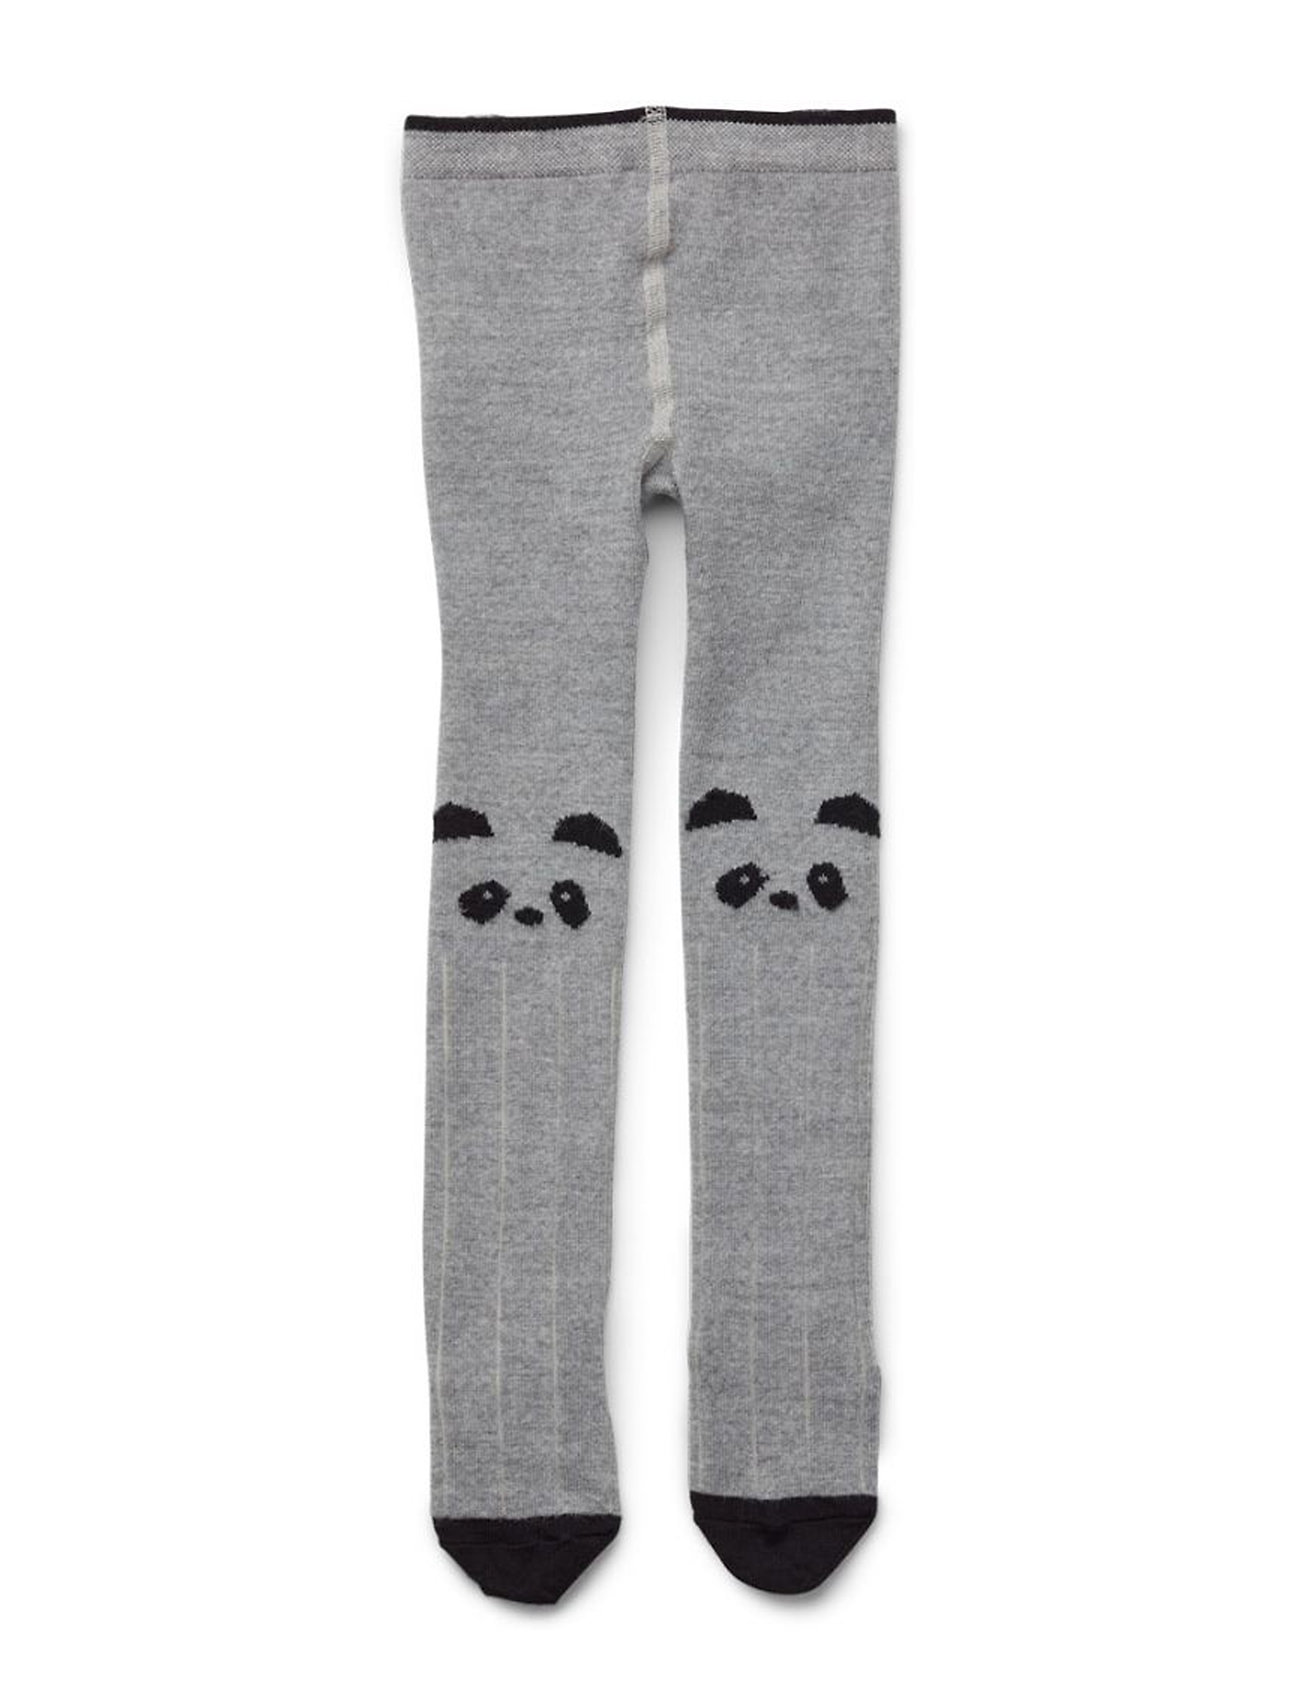 Liewood Silje wool stockings